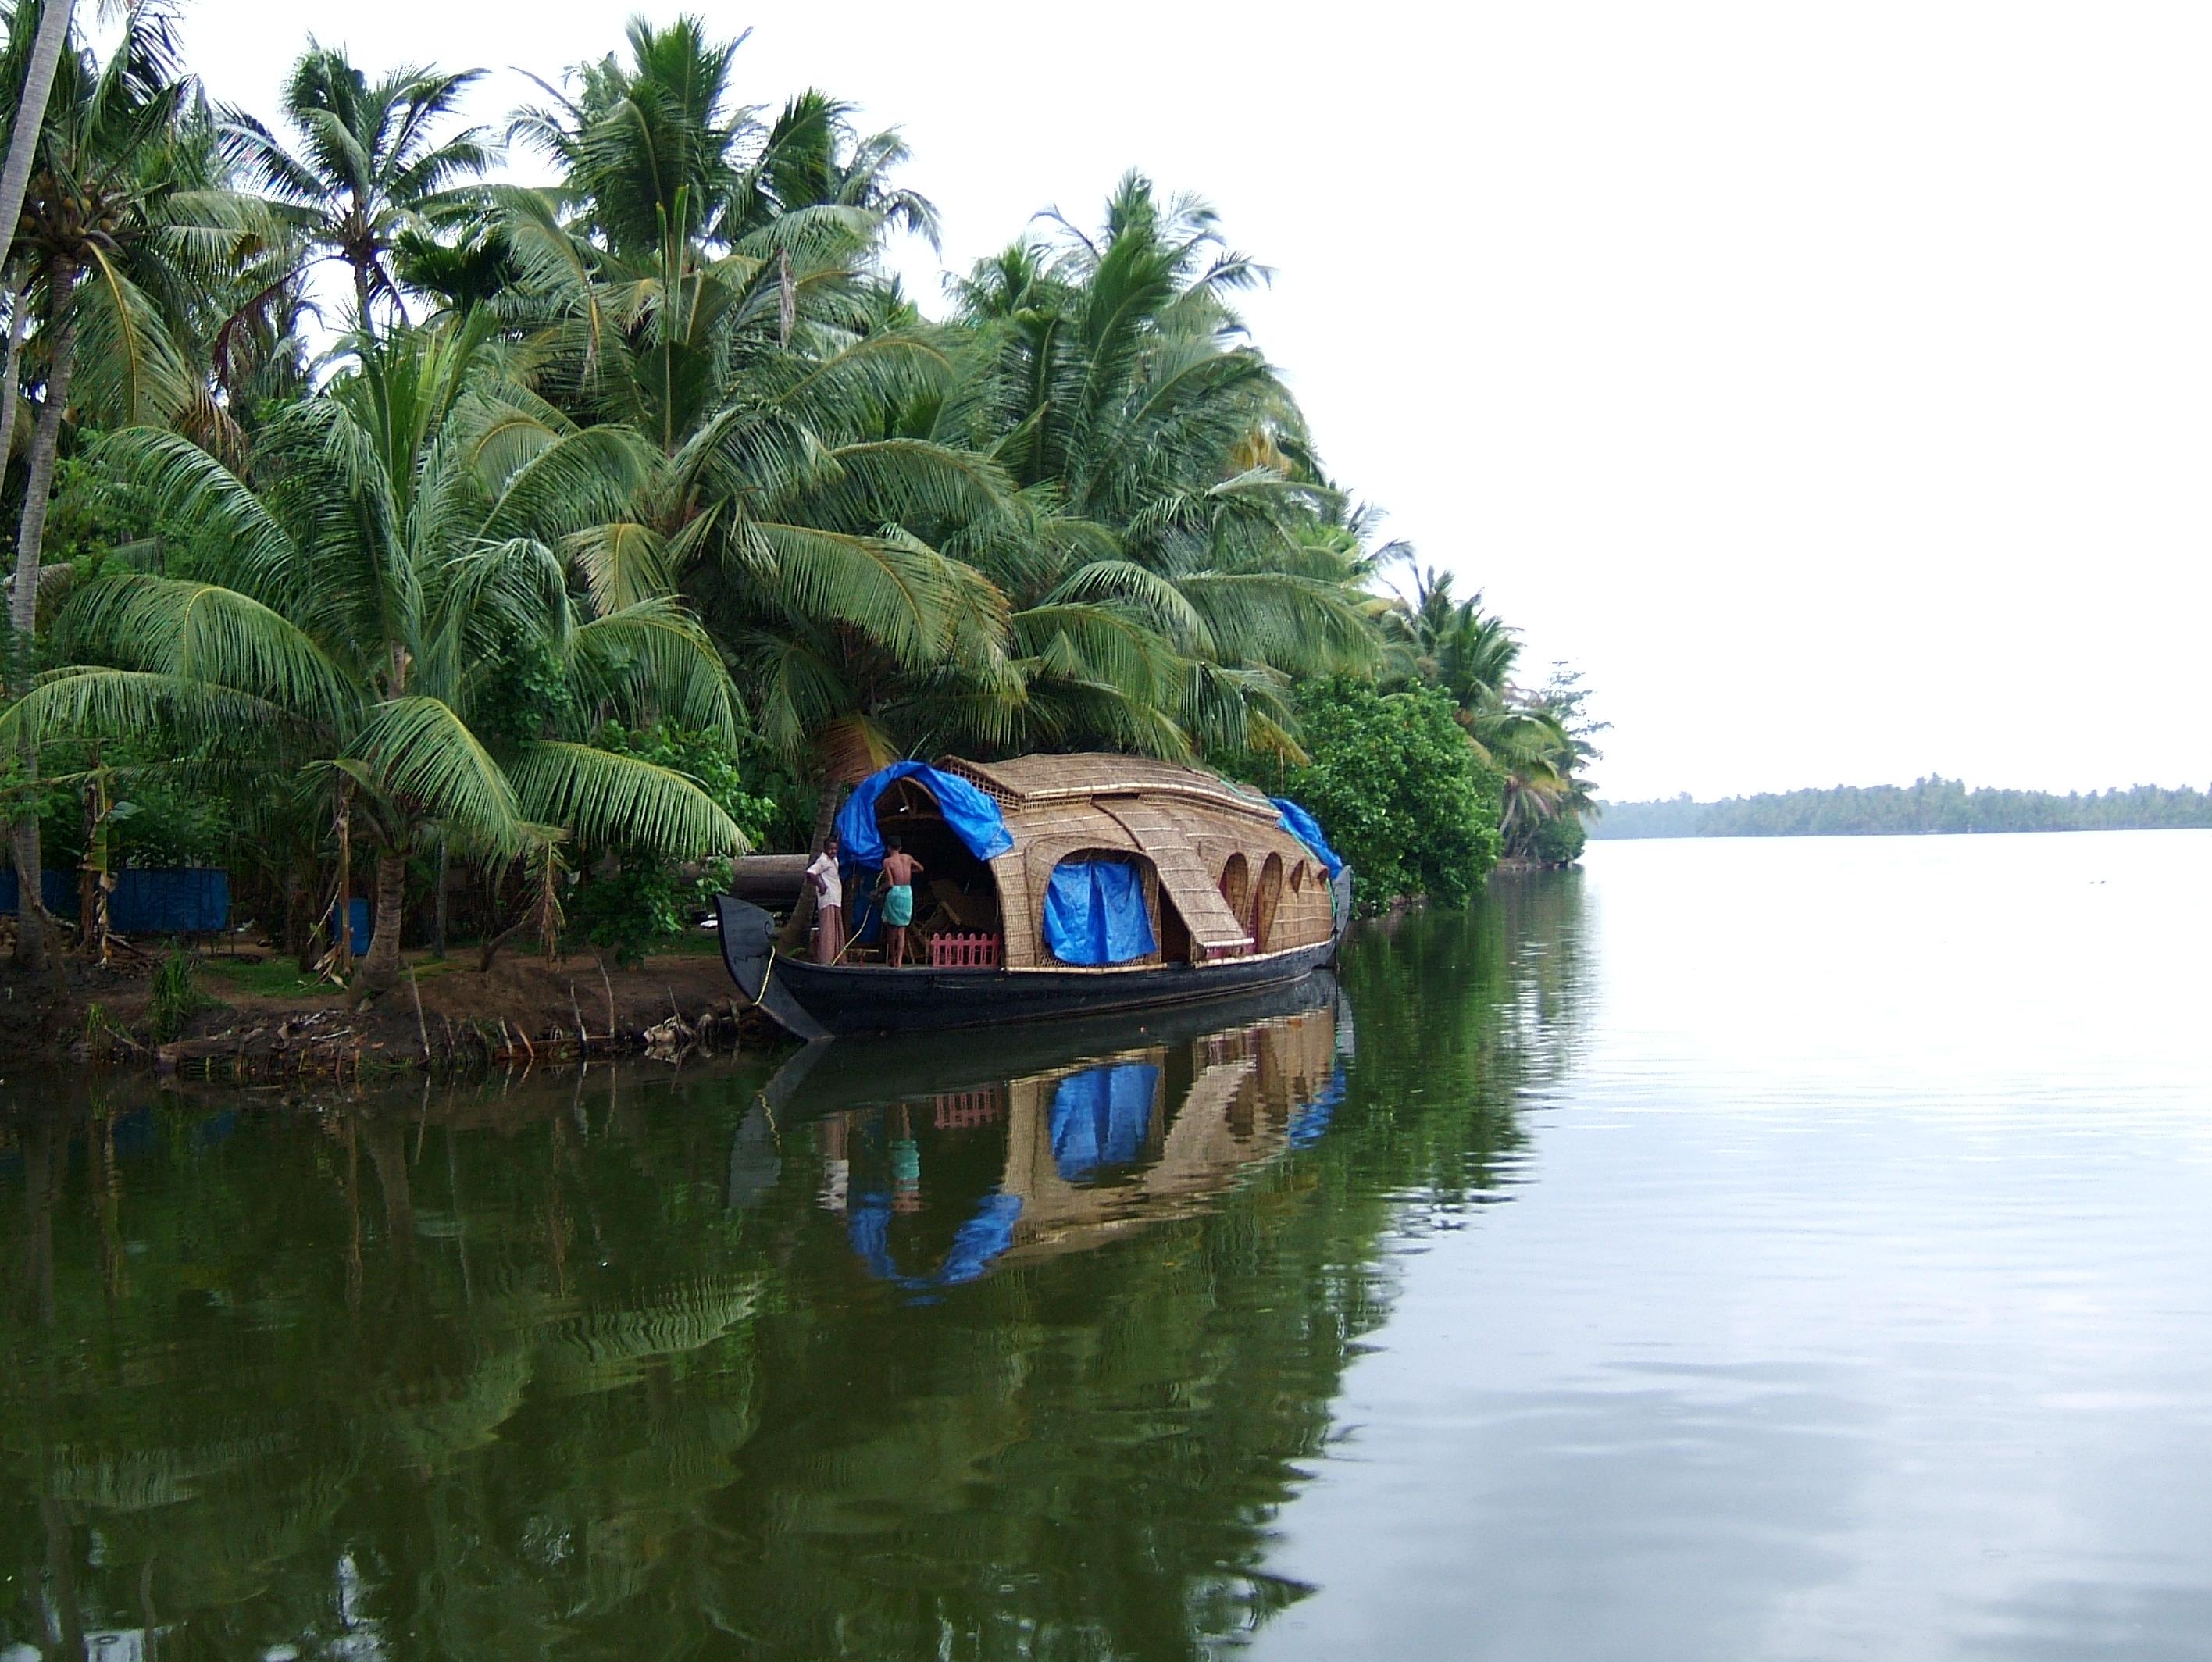 Asisbiz travel photo alblum of Kochi, formerly known as